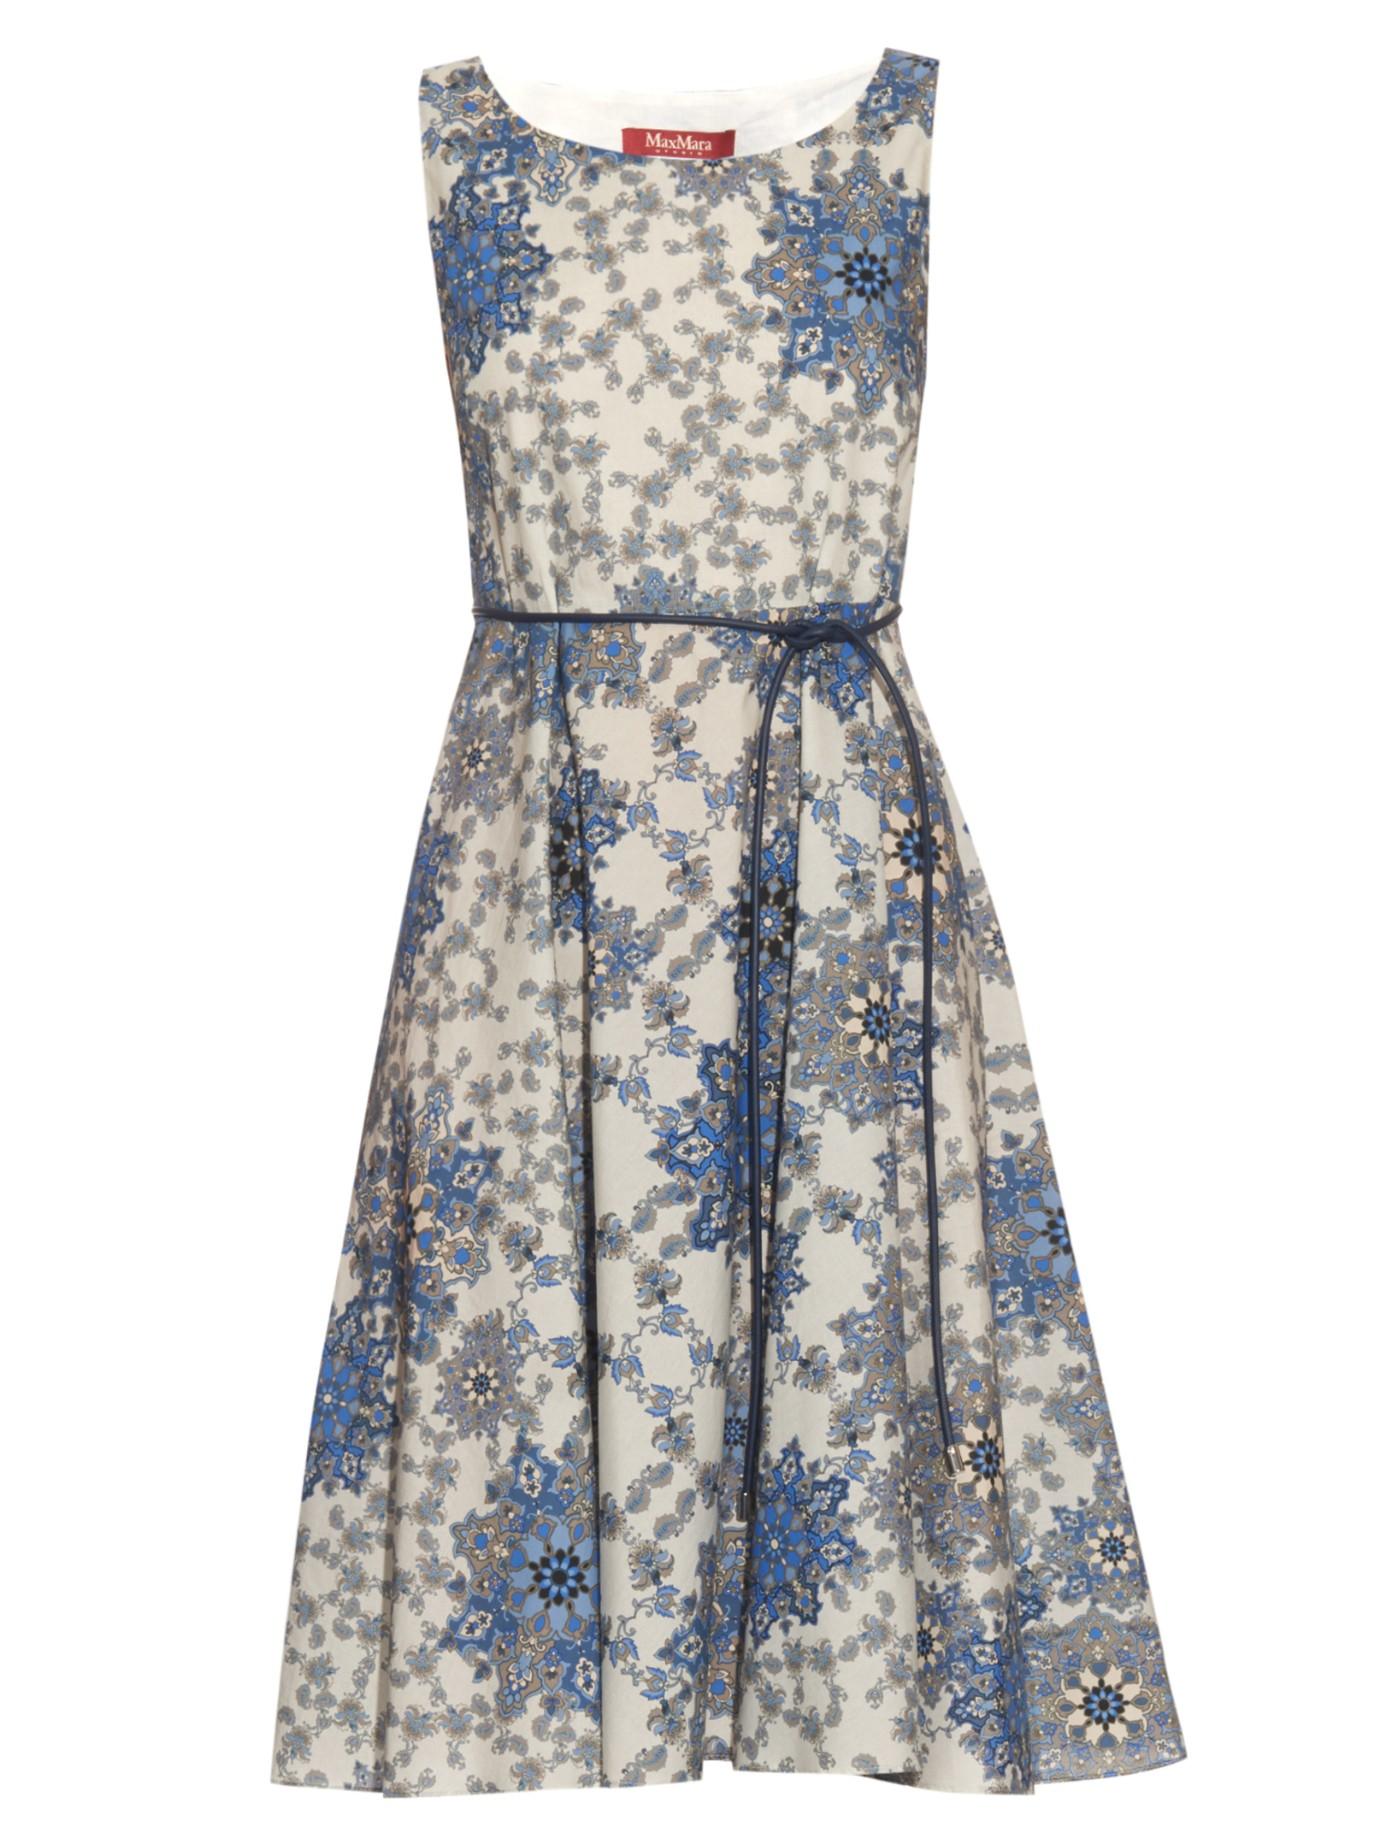 e460758bdae00 Max Mara Studio Maresca Dress in Blue - Lyst